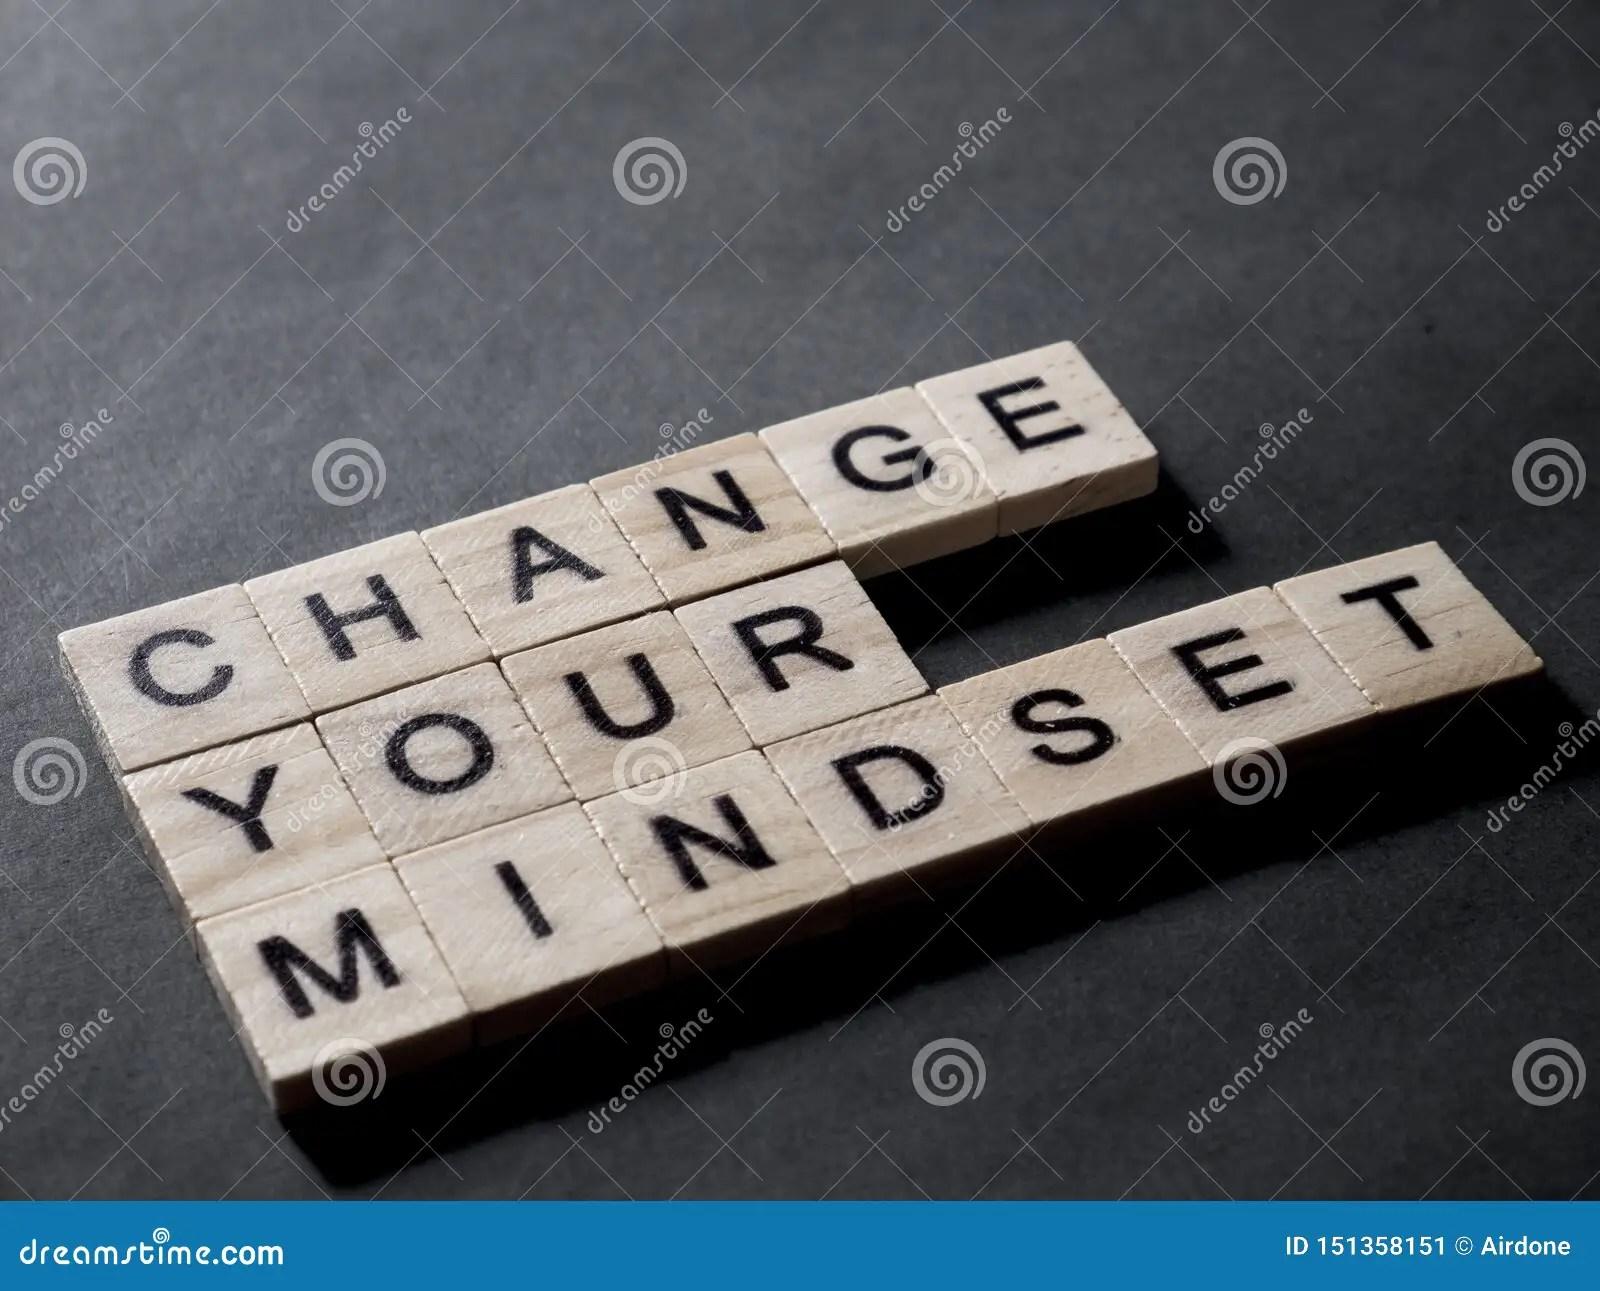 Change Your Mindset Motivational Words Quotes Concept